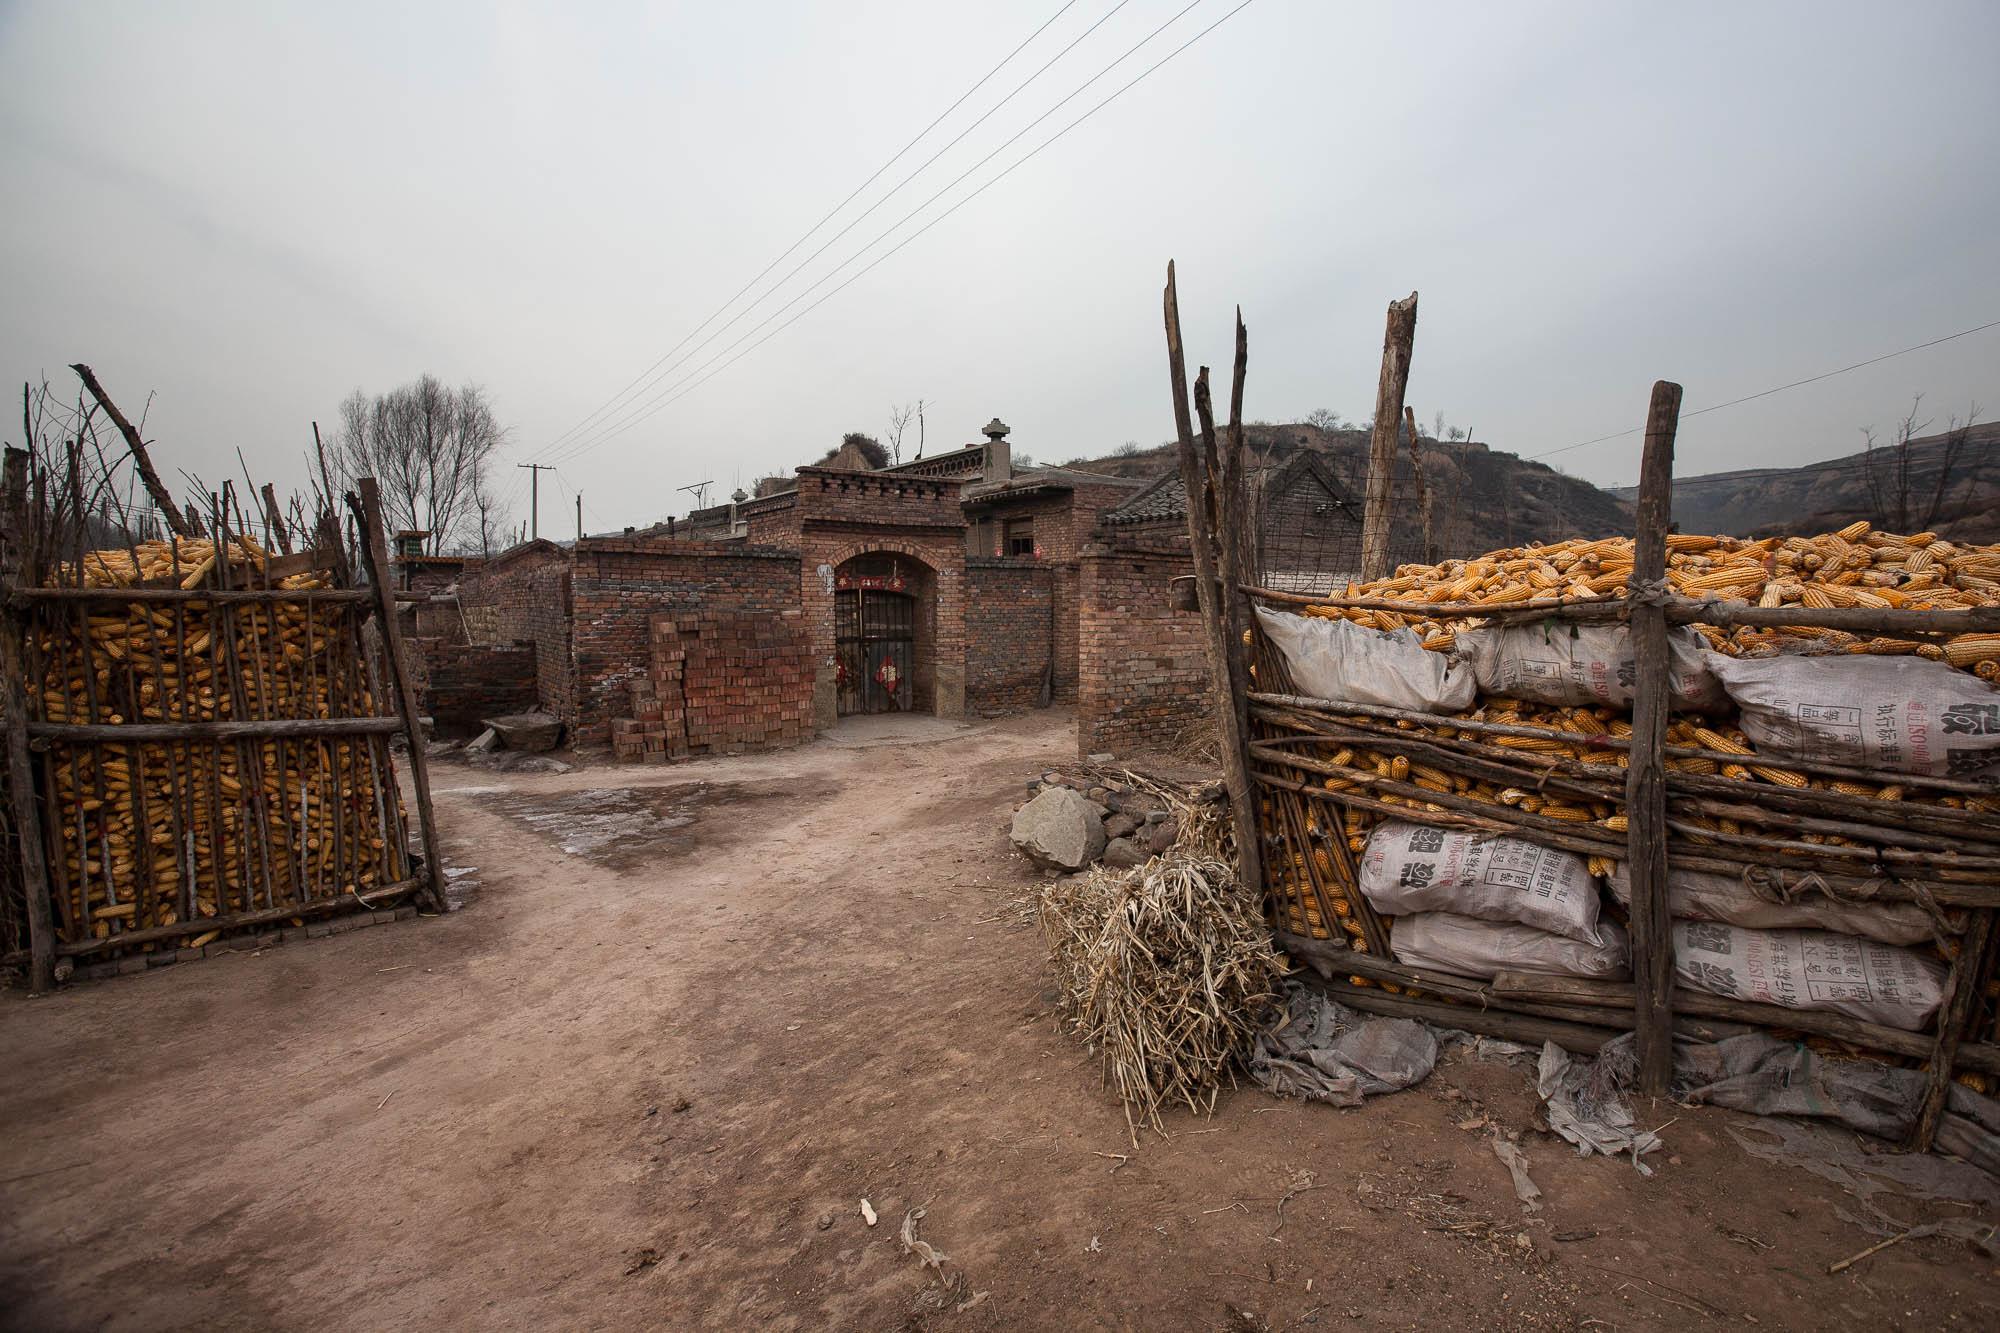 village near Shouyang